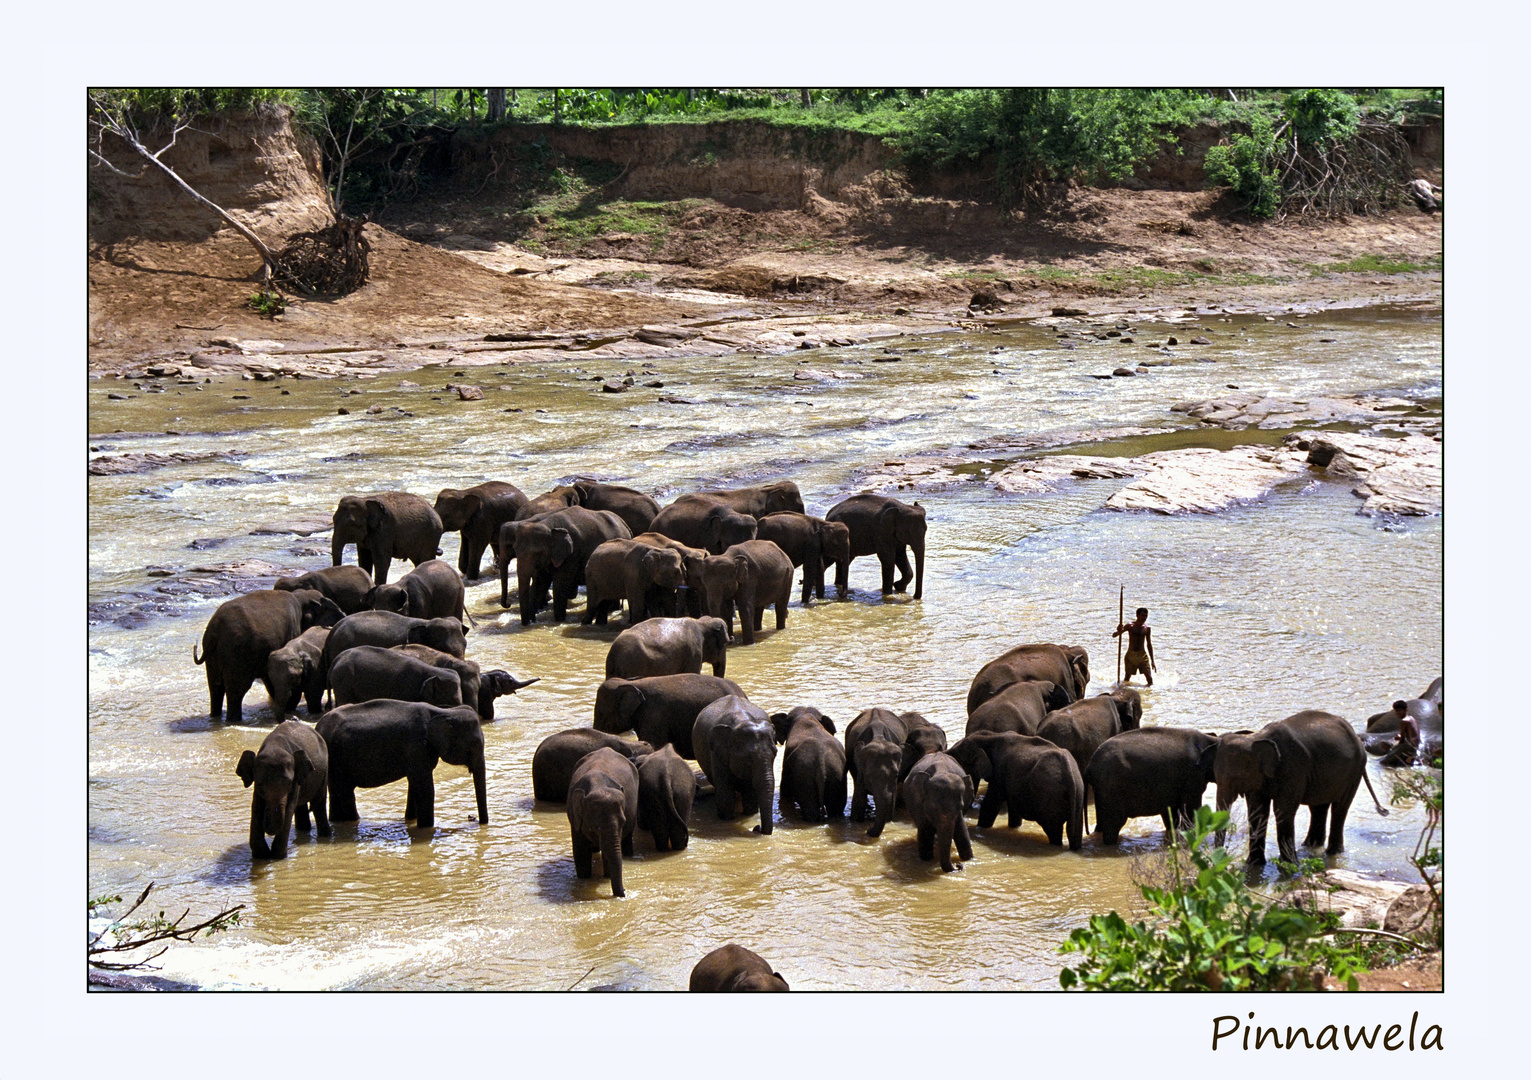 Pinnawela, das Elefantenwaisenhaus